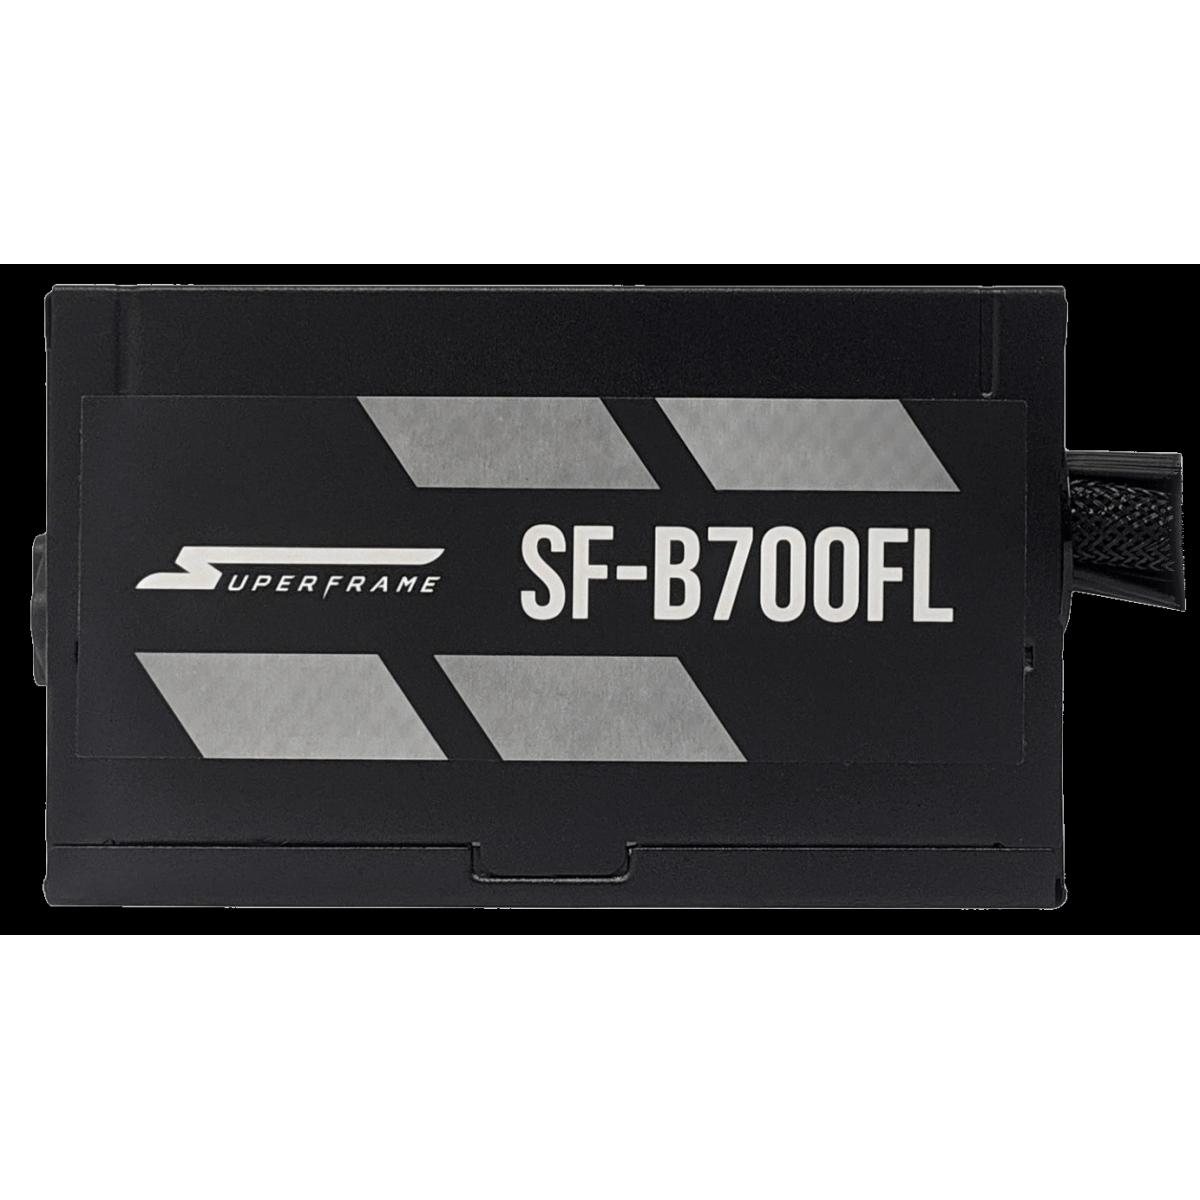 Fonte SuperFrame, 700W, 80 Plus Bronze, PFC Ativo, Cabos Flat, SF-B700FL